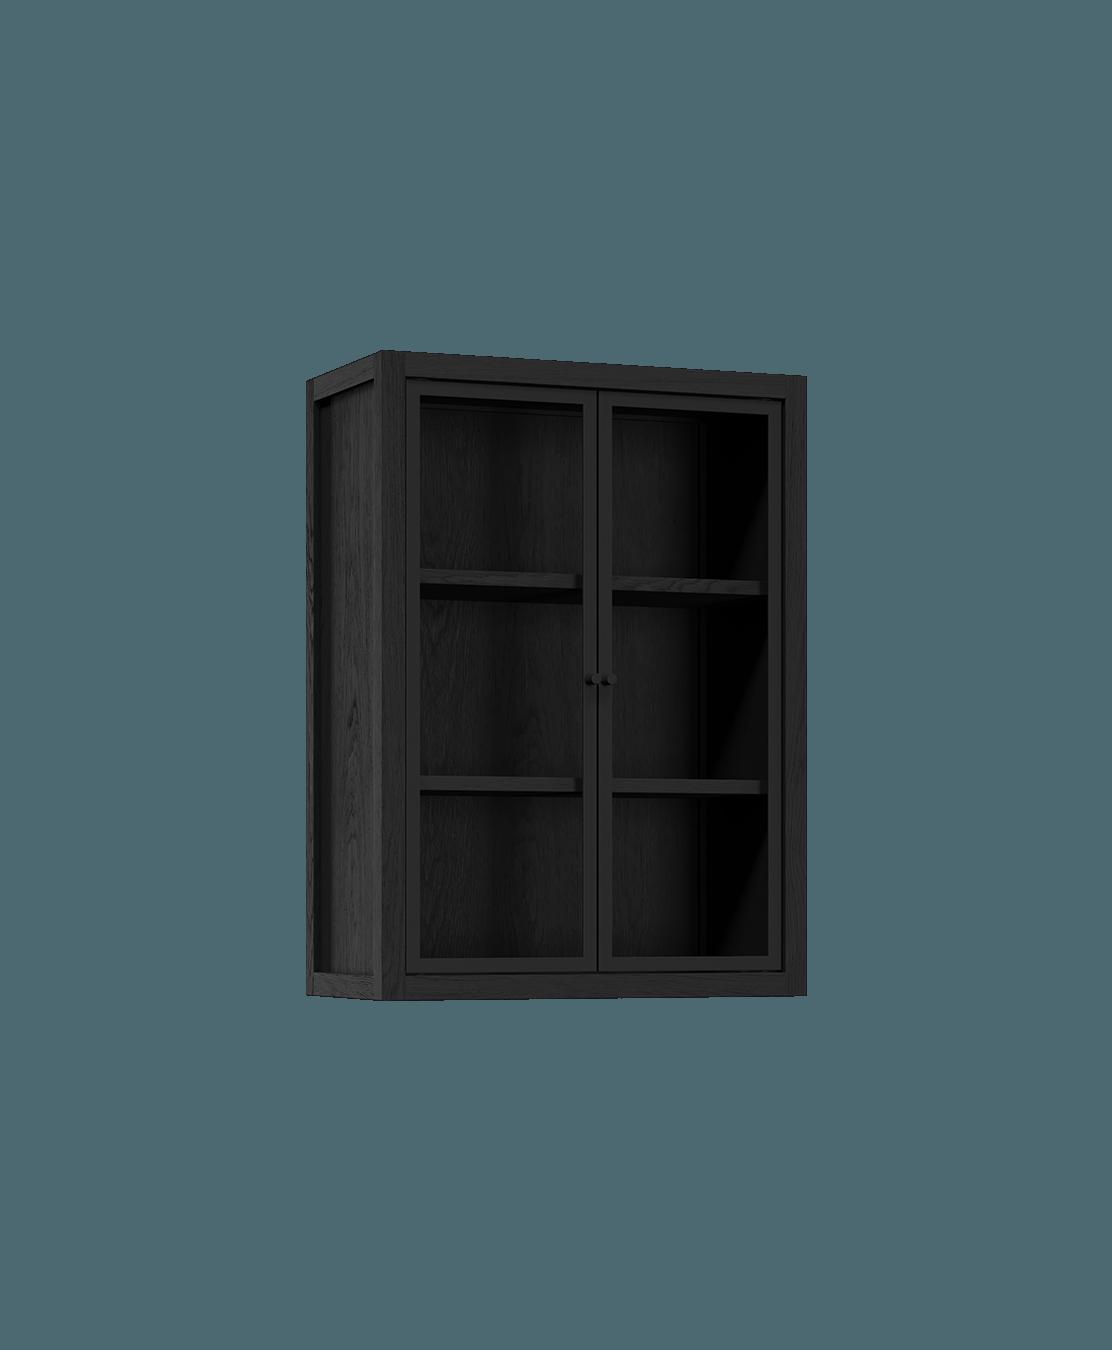 coquo radix midnight black stained oak solid wood modular 2 glass doors wall upper kitchen cabinet 12 inch C1-W-2412-0202-BK